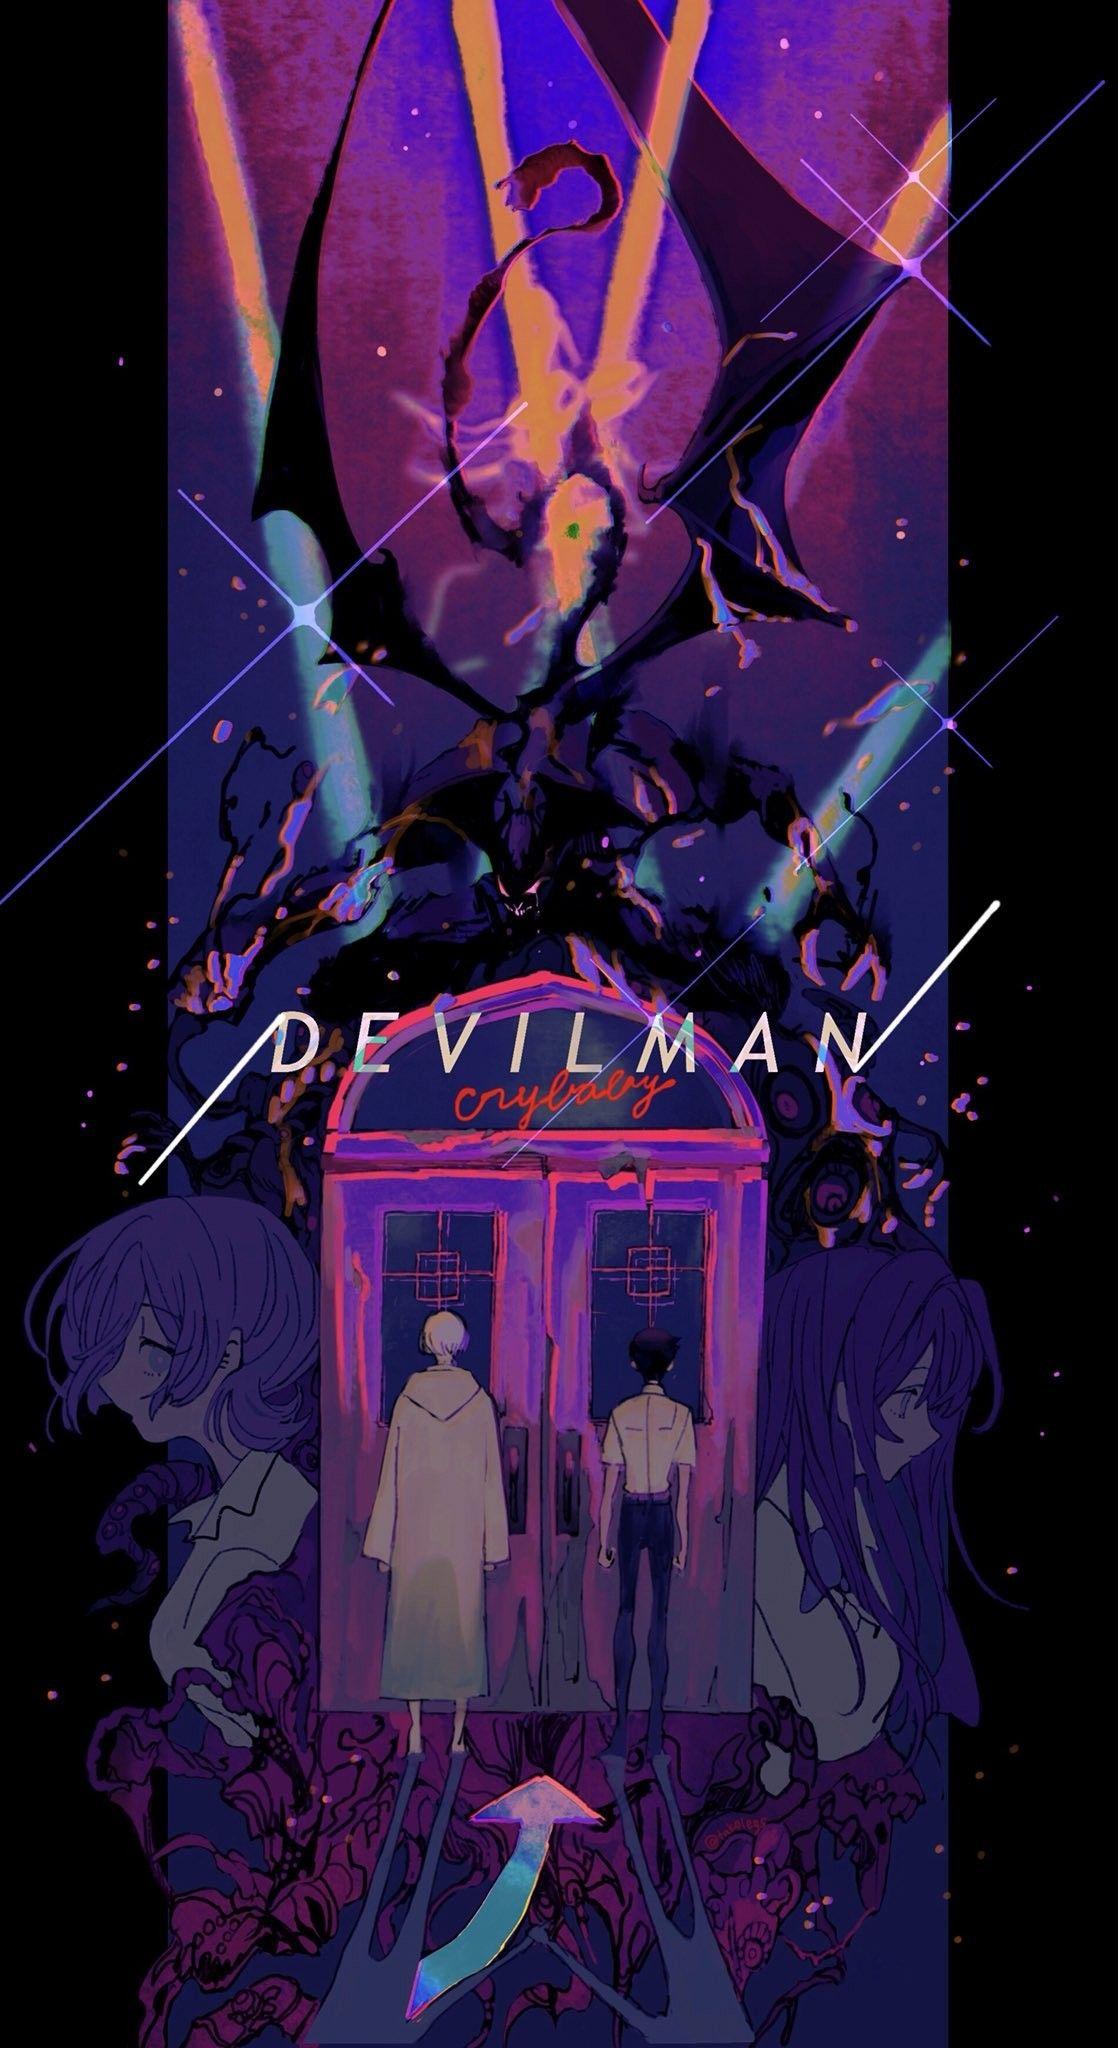 Ryo Asuka Akira Fudo Miki Makimura Miki Kuroda Anime Wall Art Anime Wallpaper Devilman Crybaby